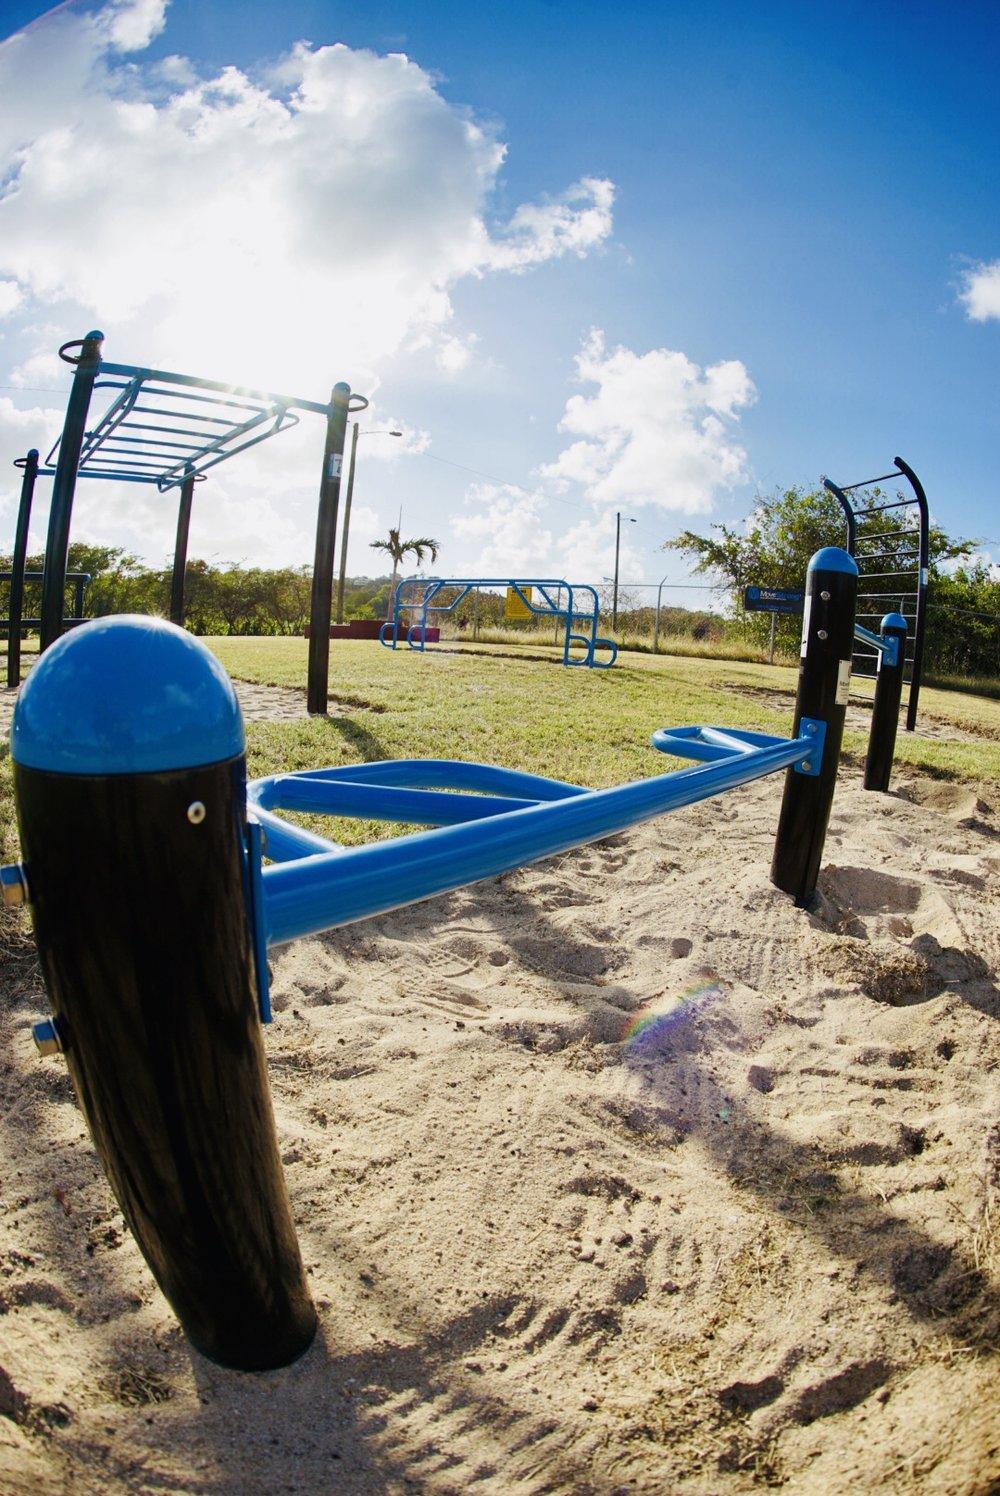 Push-up bars outdoor gym equipment